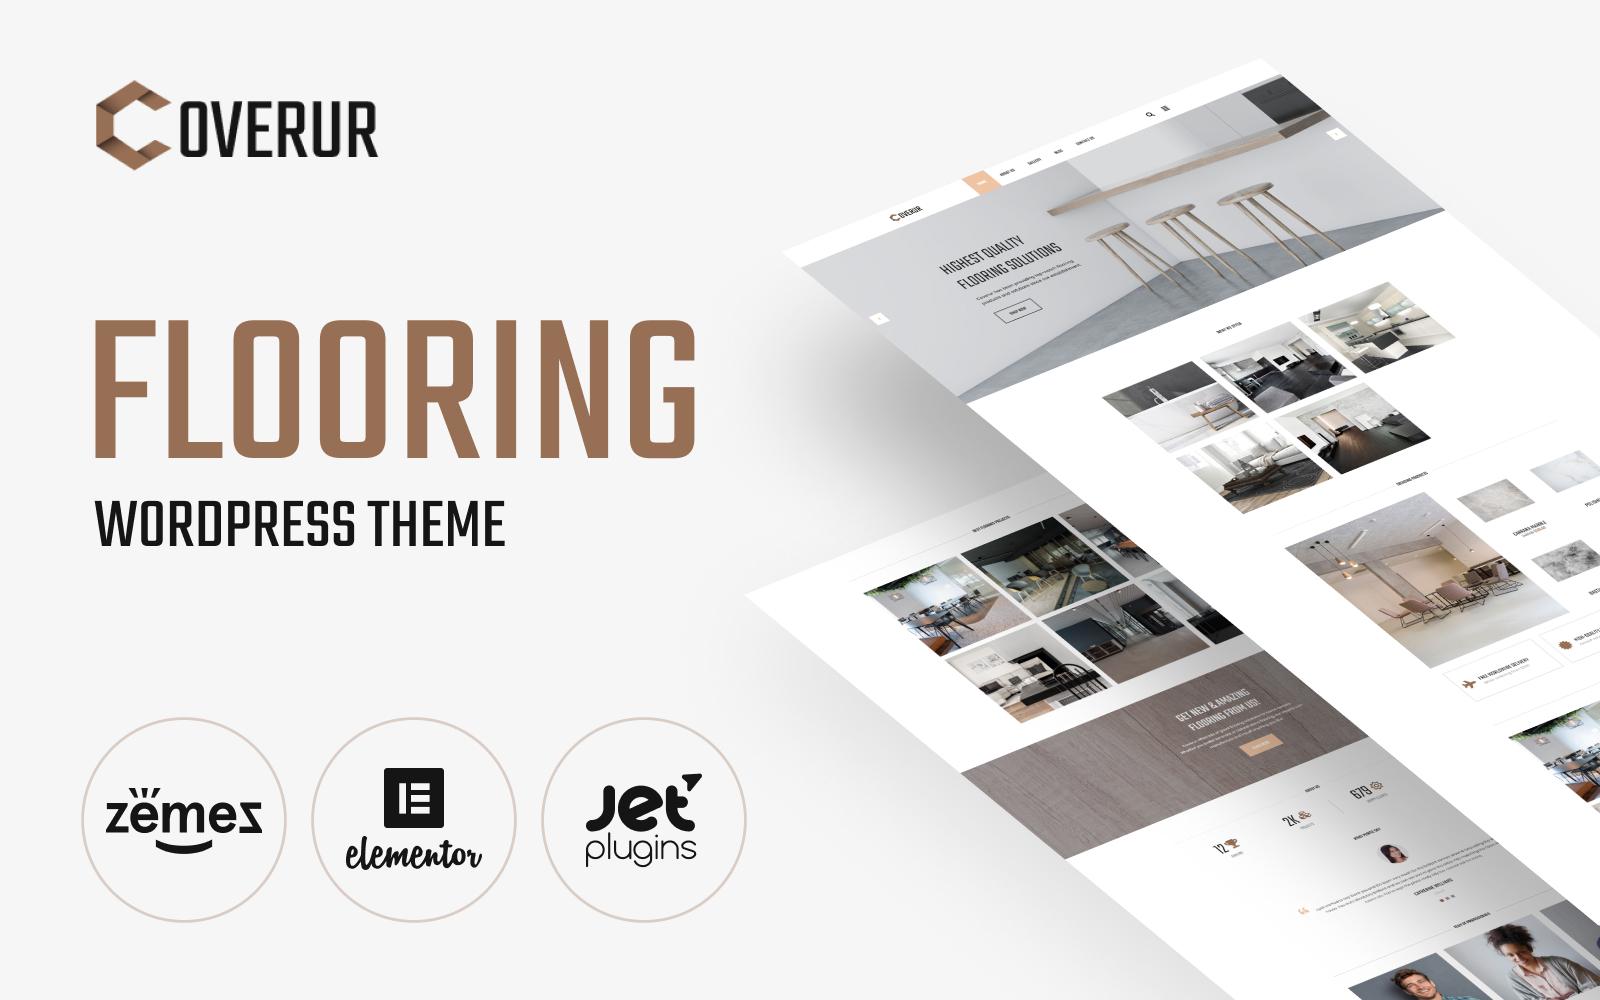 """Coverur - Flooring Company Multipurpose Minimal Elementor"" thème WordPress adaptatif #81169"